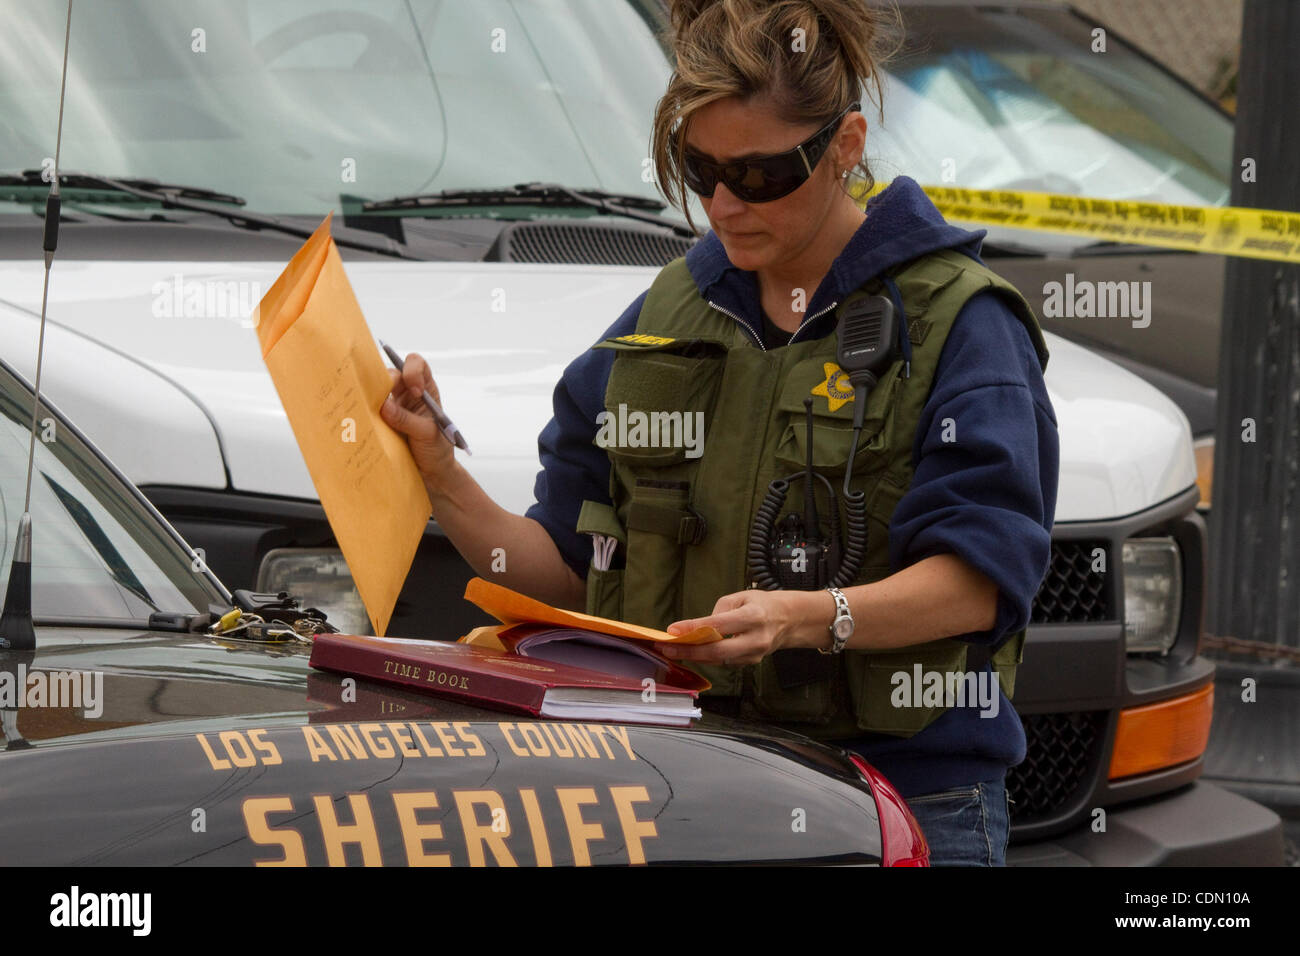 Apr  20, 2011 - Los Angeles, California, U S - A Los Angeles Sheriff